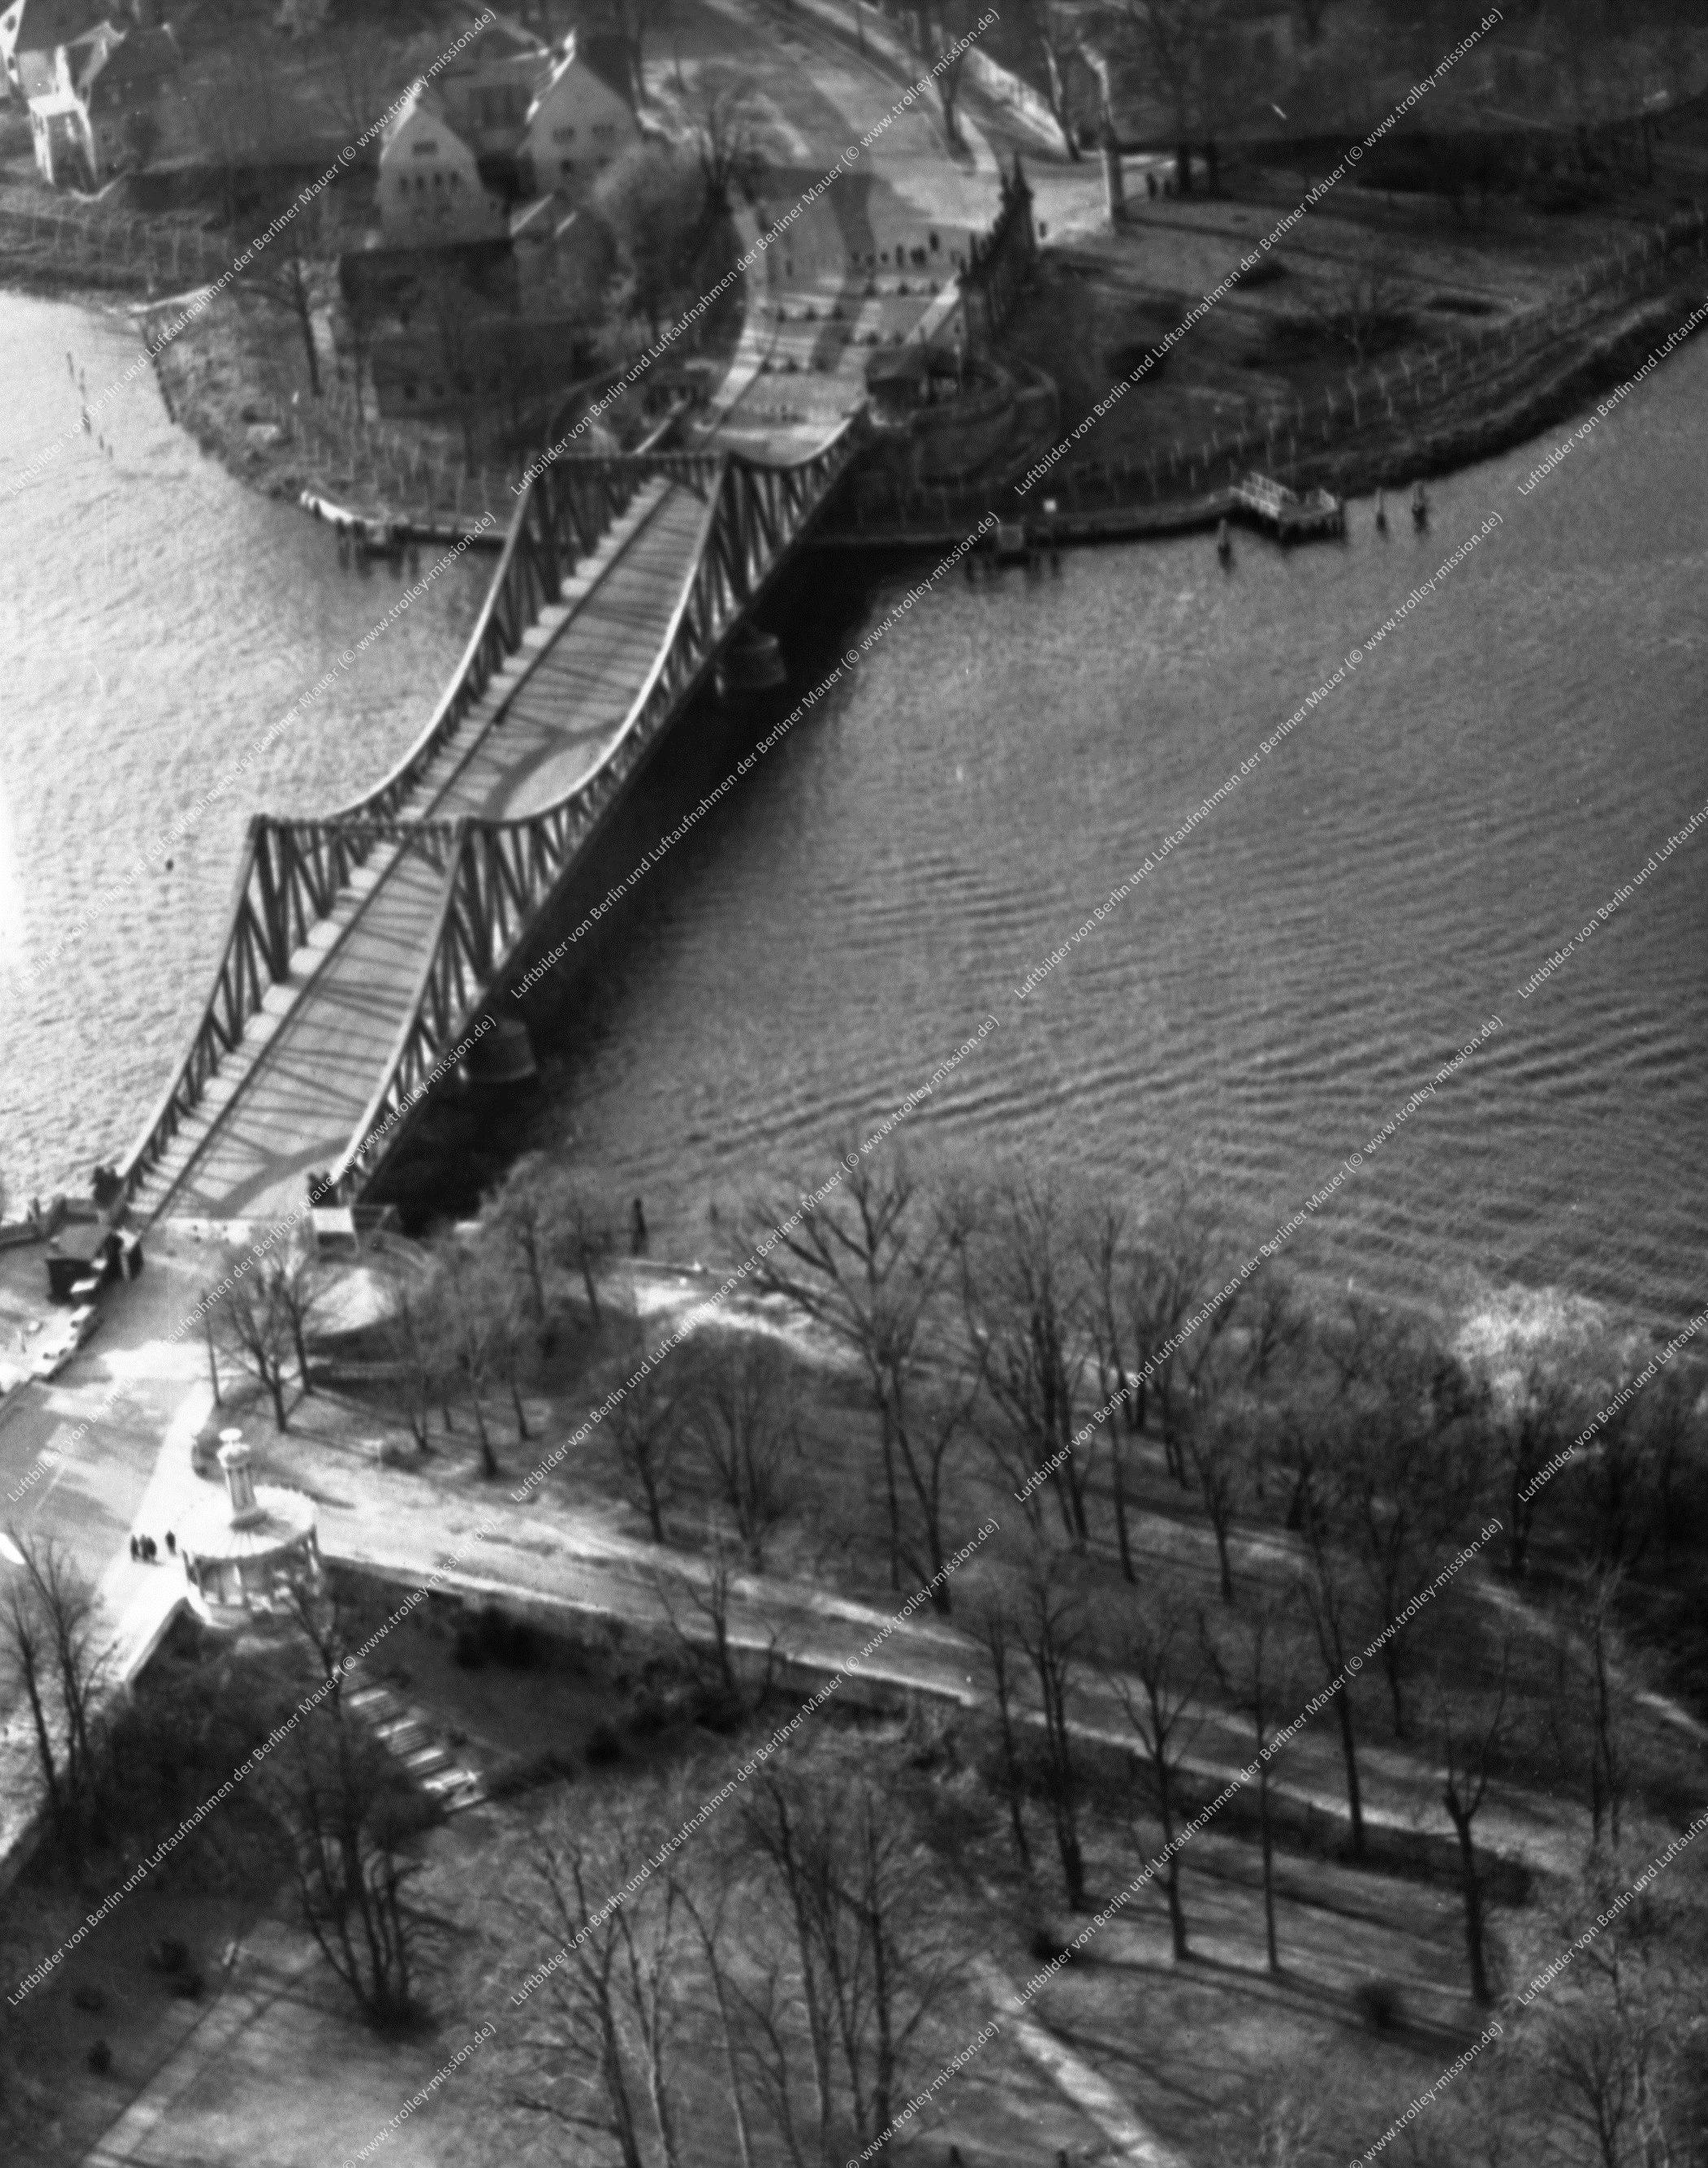 Berlin Luftbild Glienicker Brücke (Bild 007)